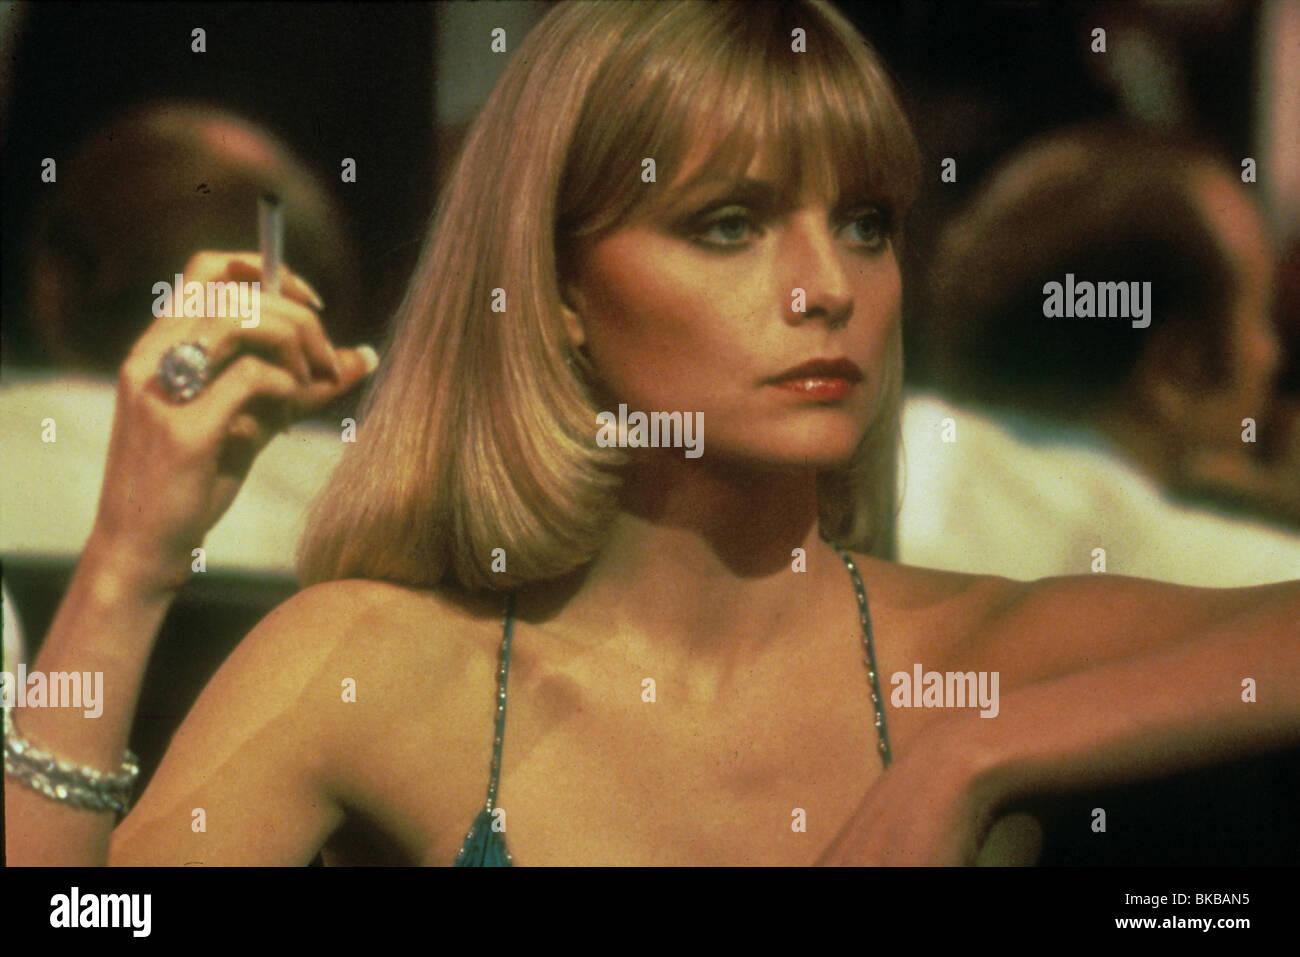 SCARFACE -1983 MICHELLE PFEIFFER - Stock Image